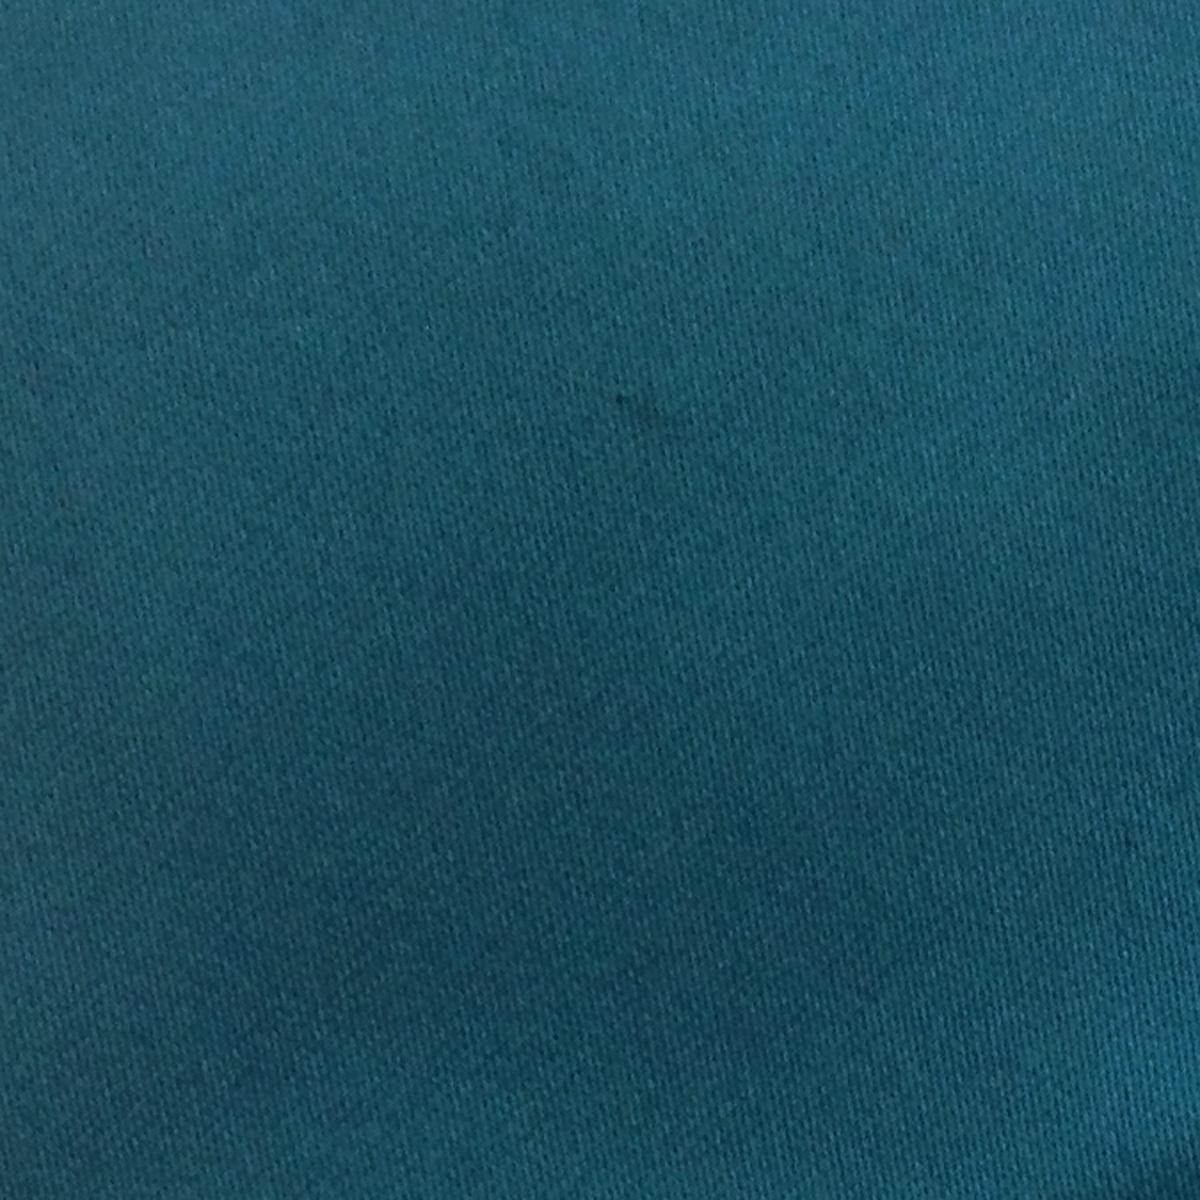 B1764 11 dark teal mens ties facemasks con murphys menswear cork - - Con Murphys Menswear